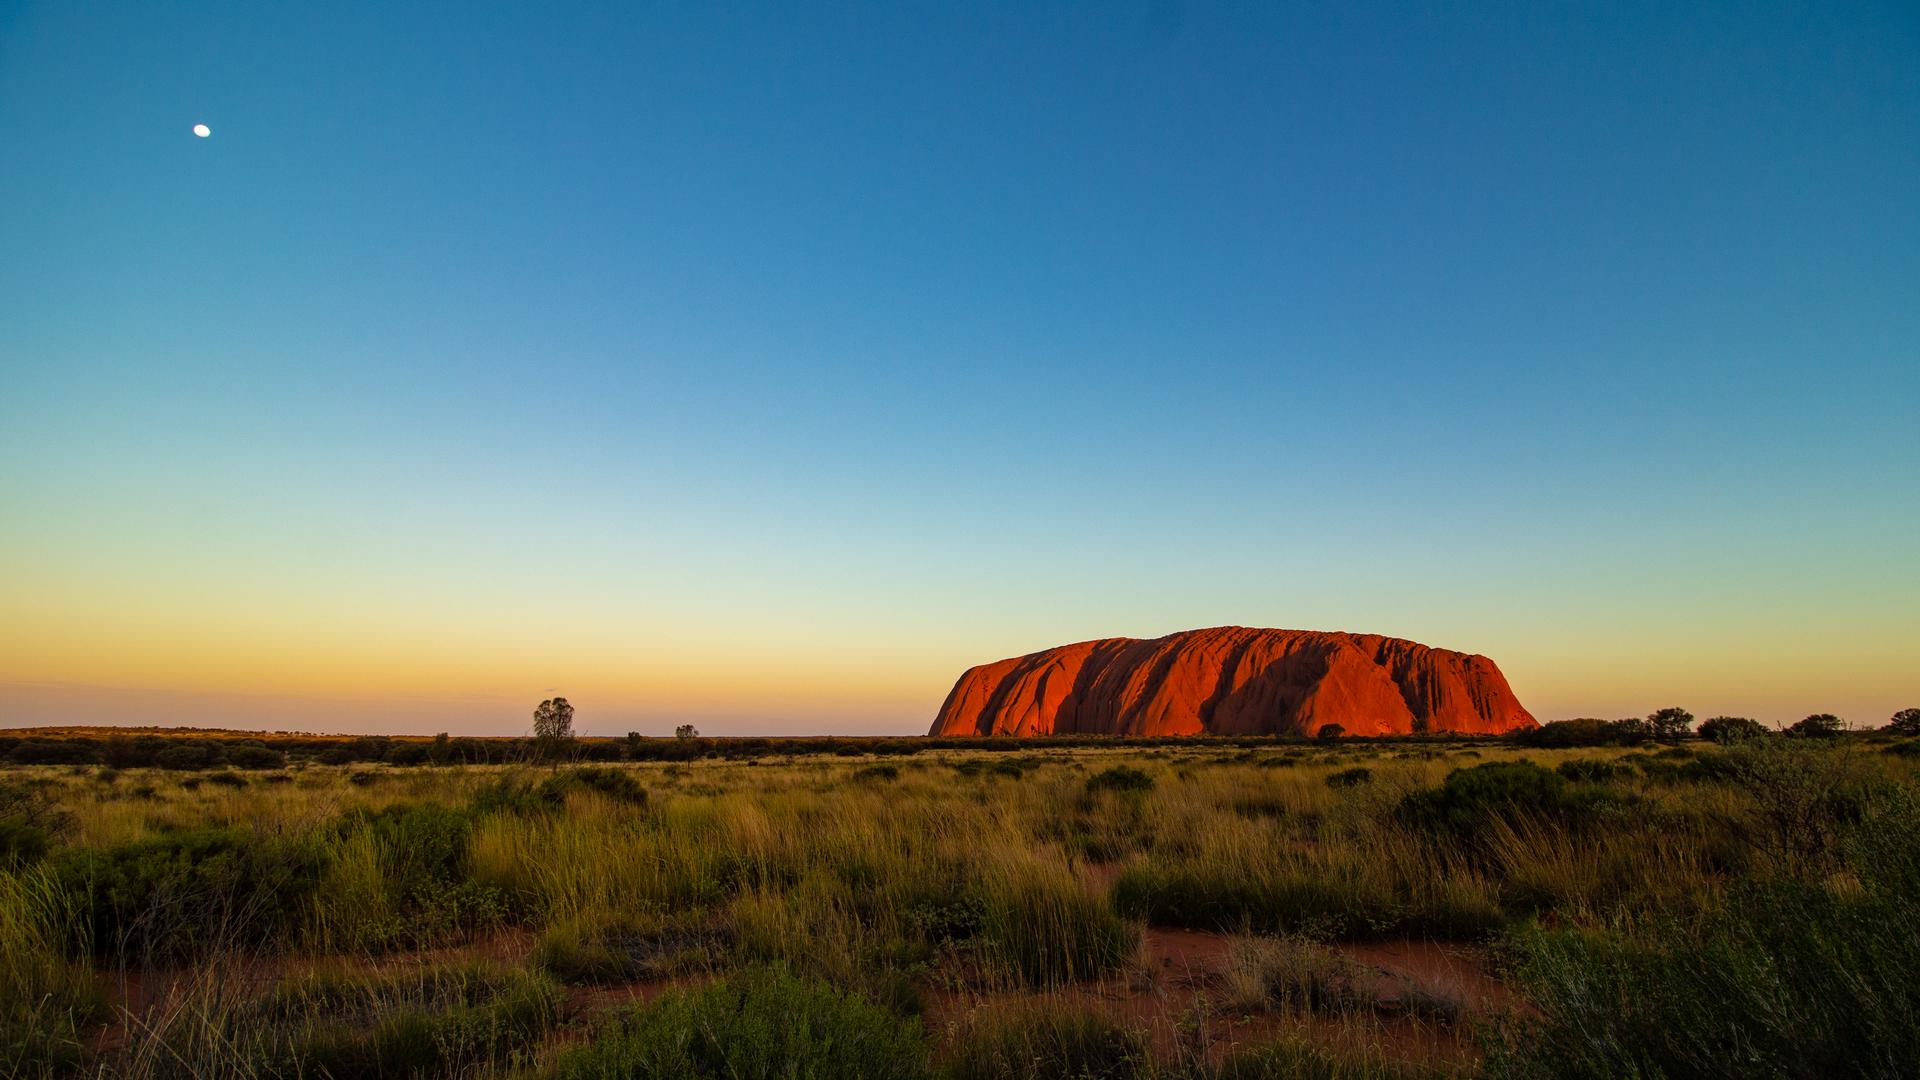 A view in Australia